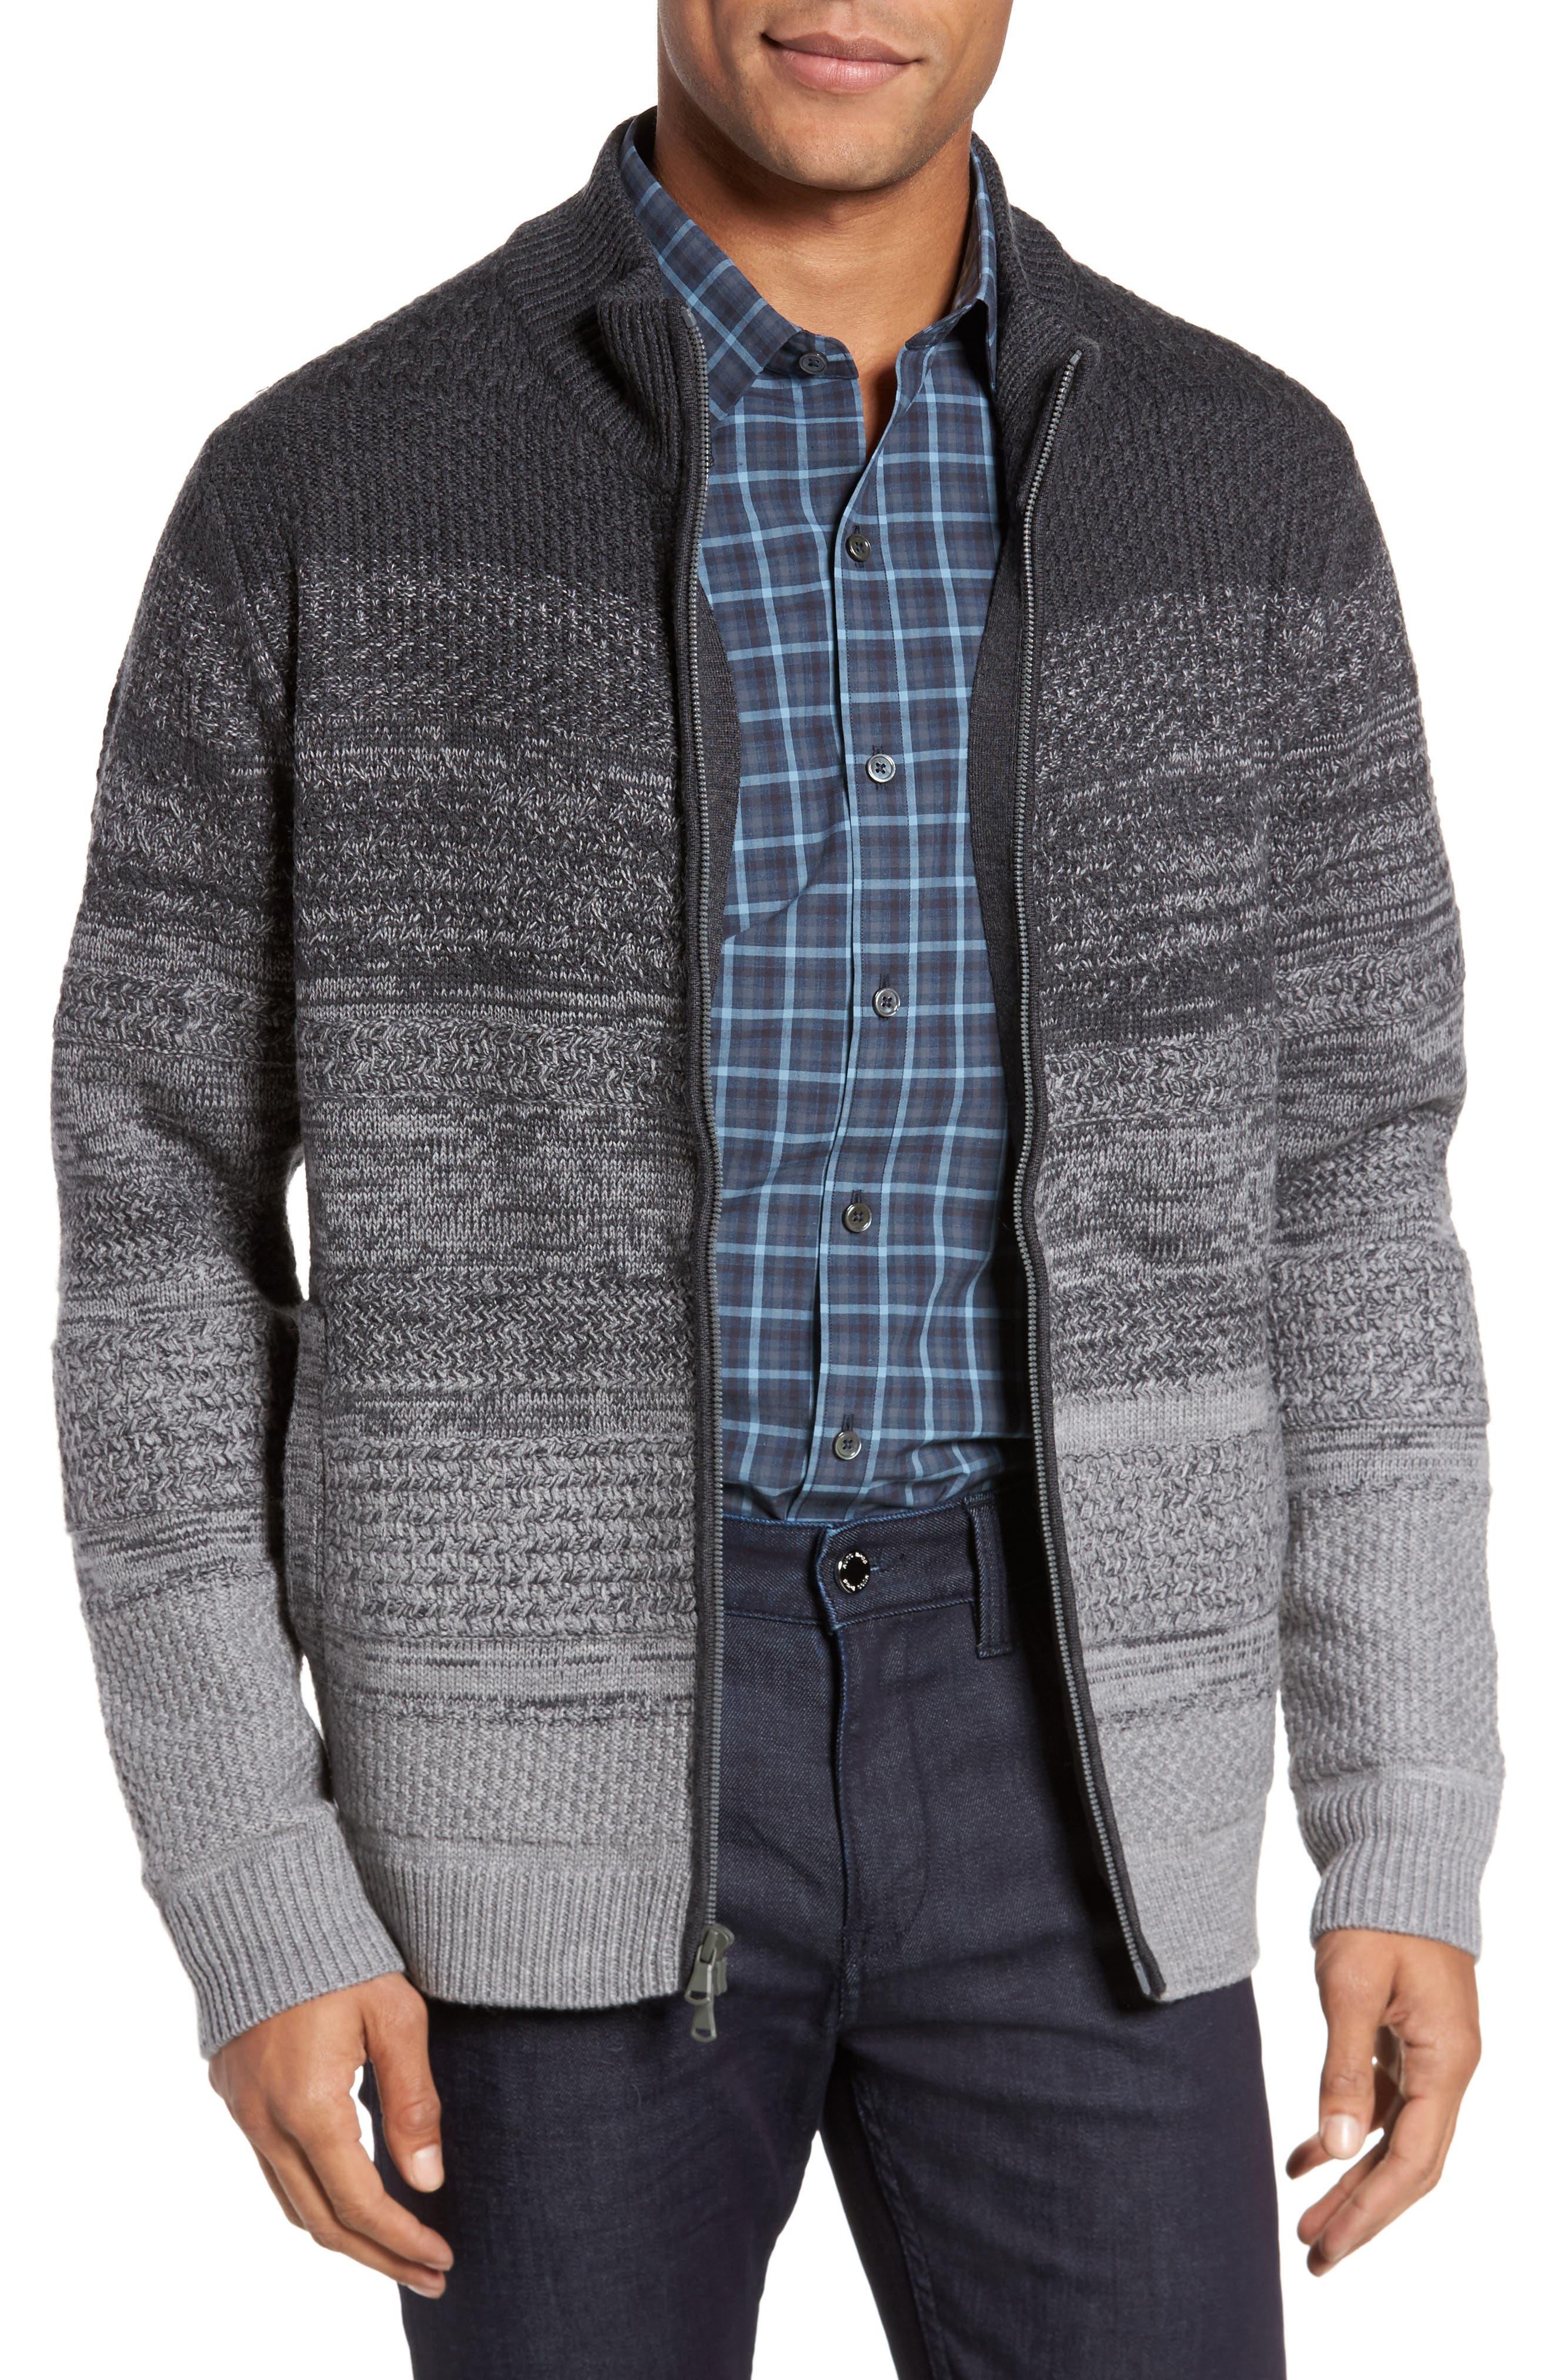 Hawkins Degrade Merino Full Zip Cardigan,                             Main thumbnail 1, color,                             Grey